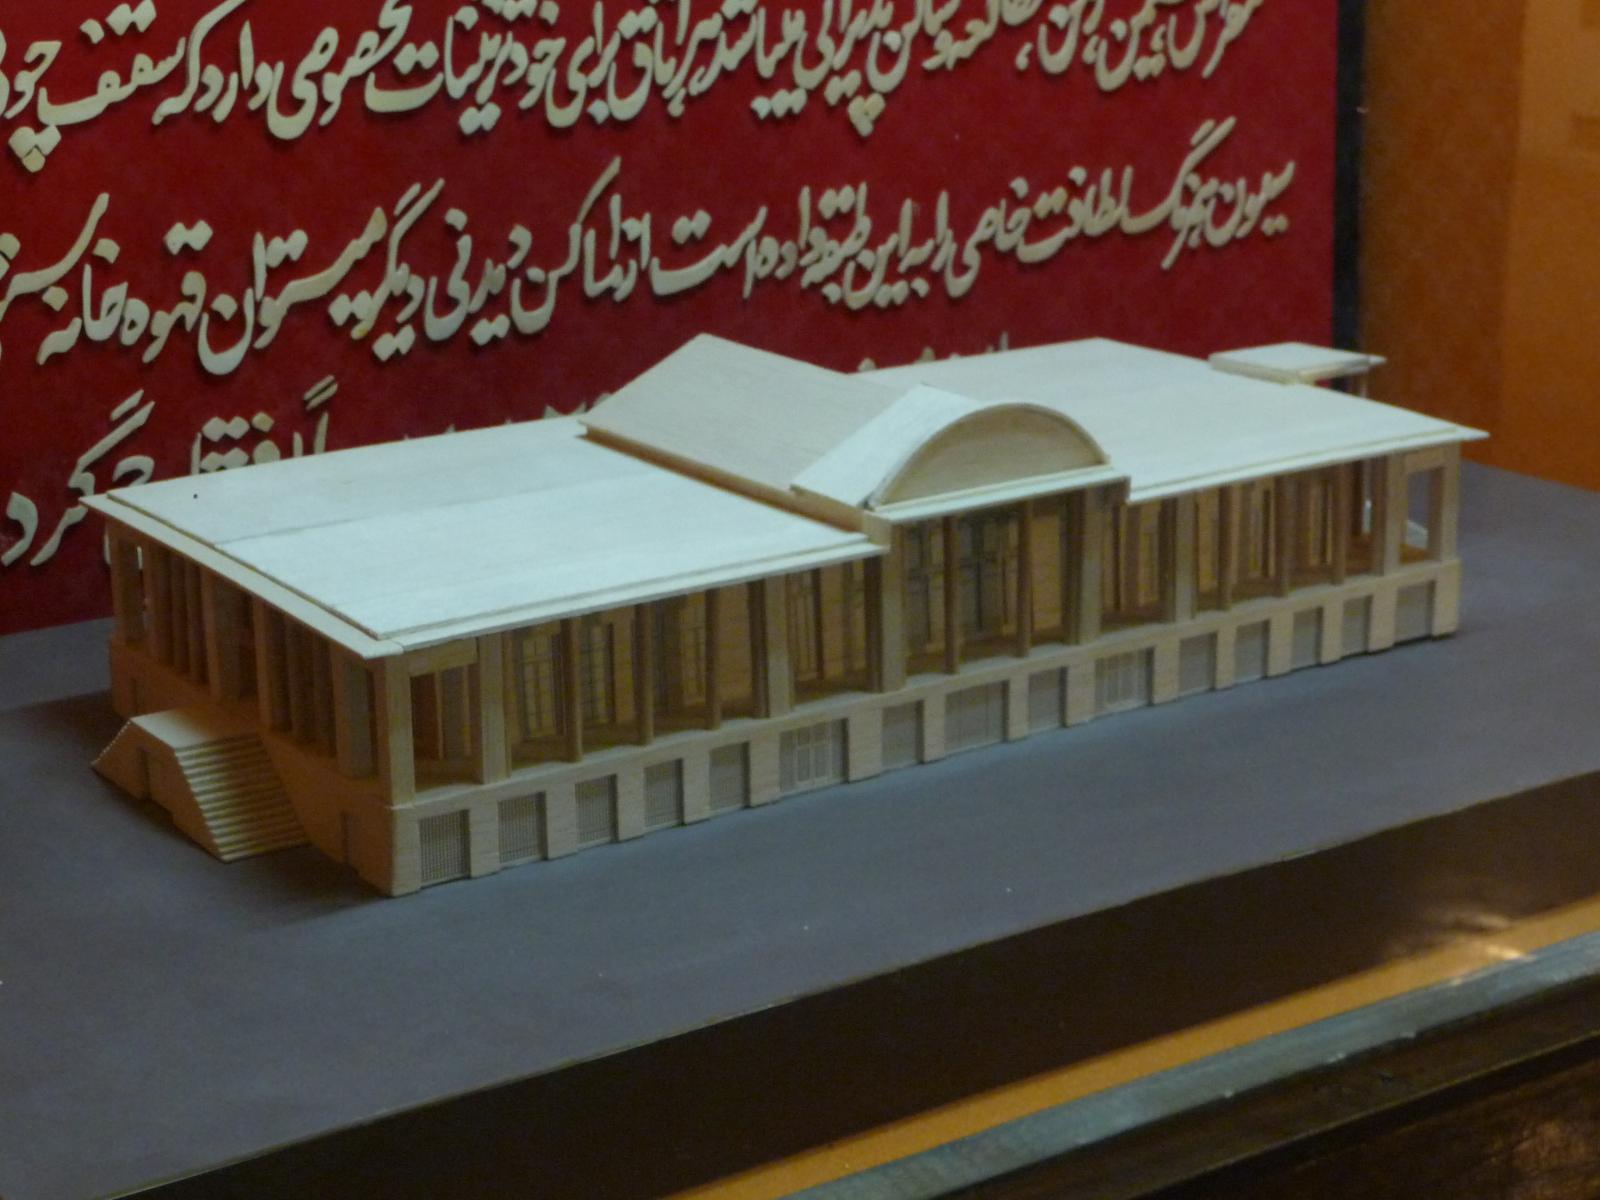 Baq-e Afifabad - Museum - Miniature Model Afifabad